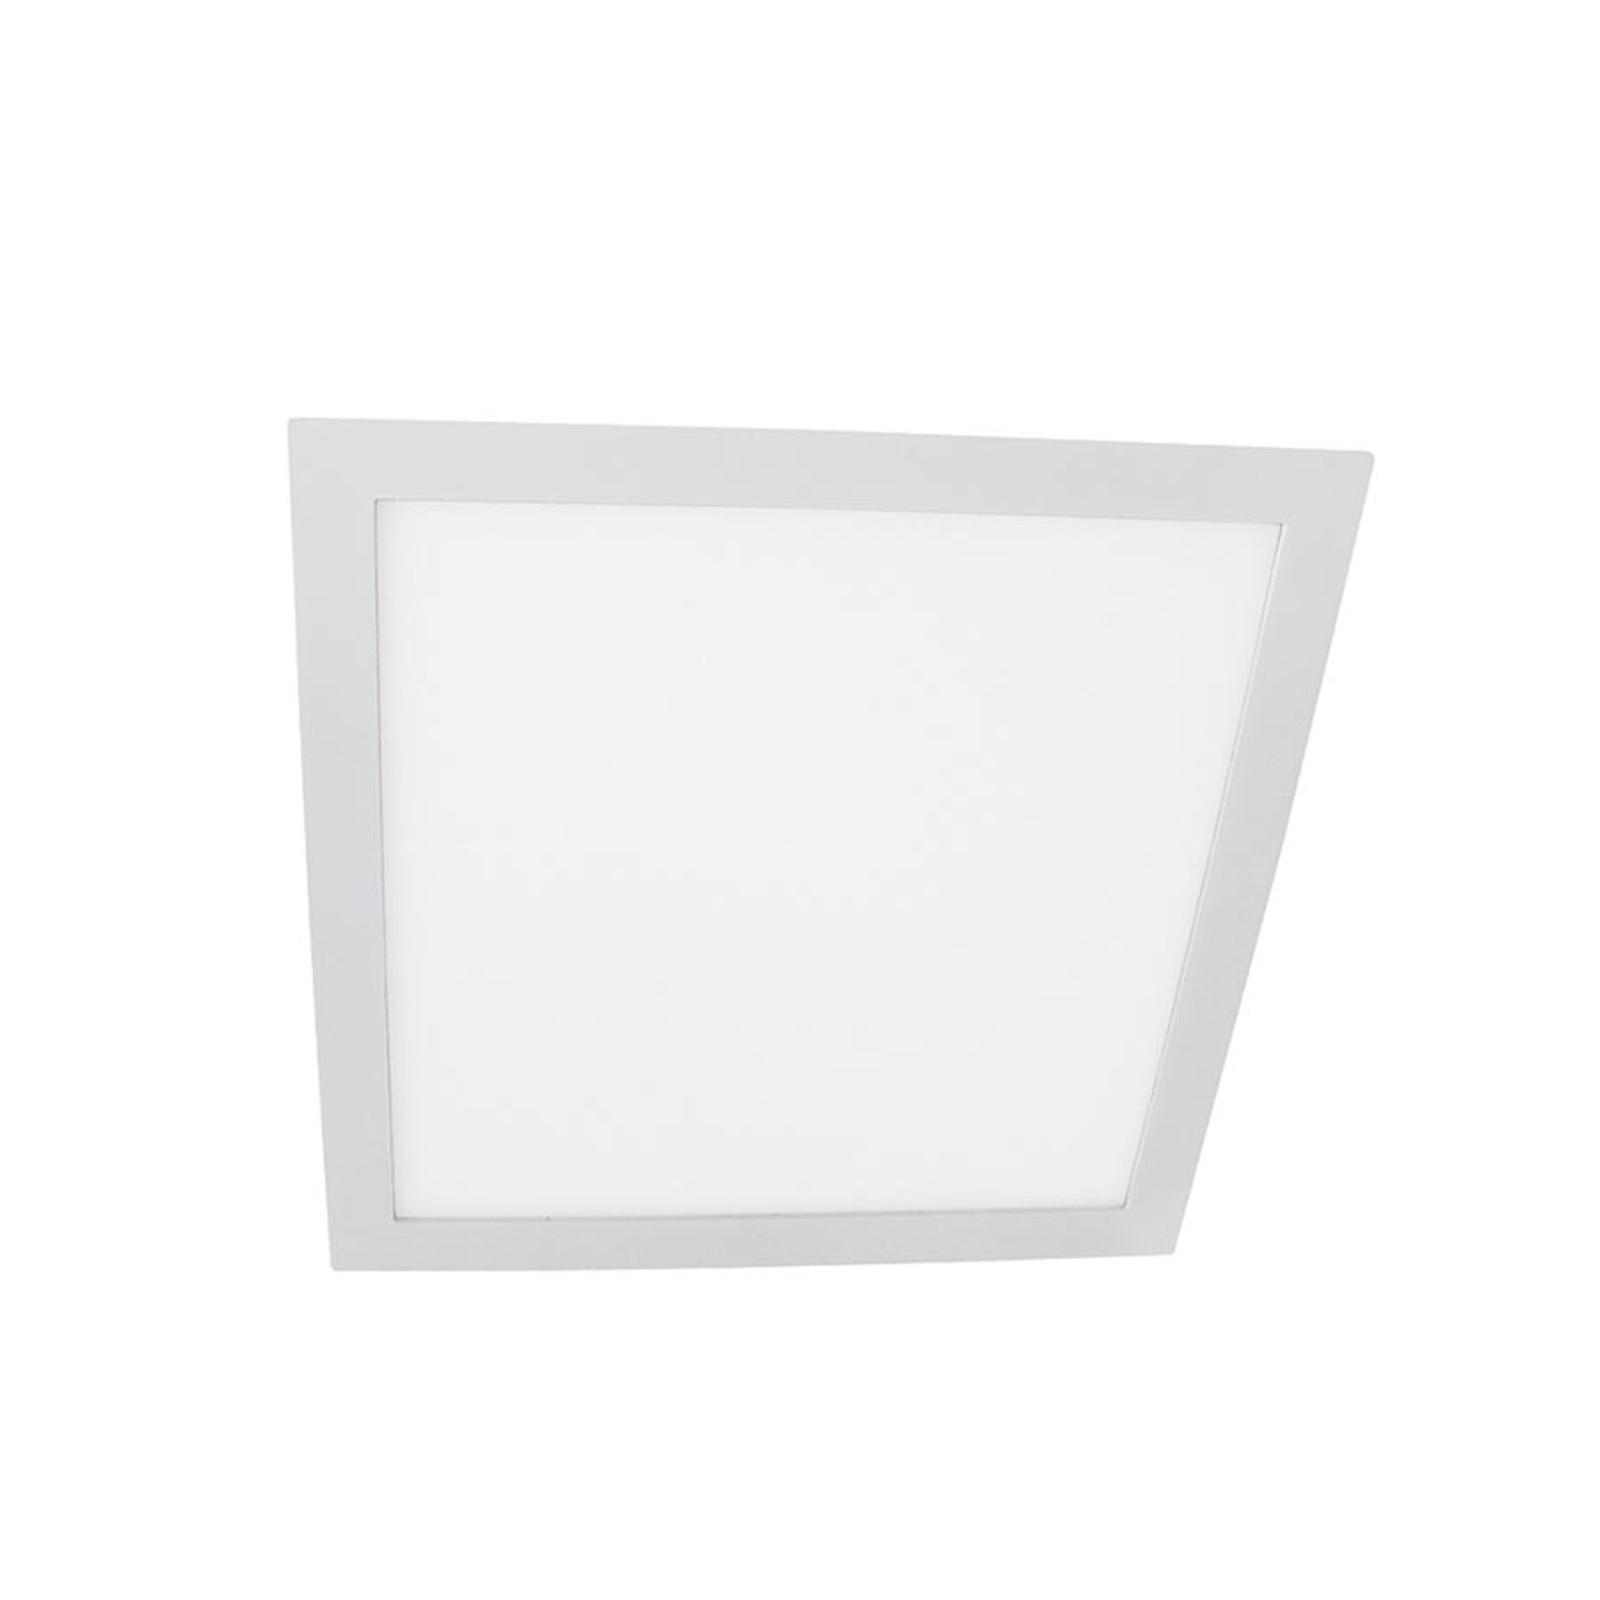 Moon Square LED-Einbauleuchte 6W, 3.000K